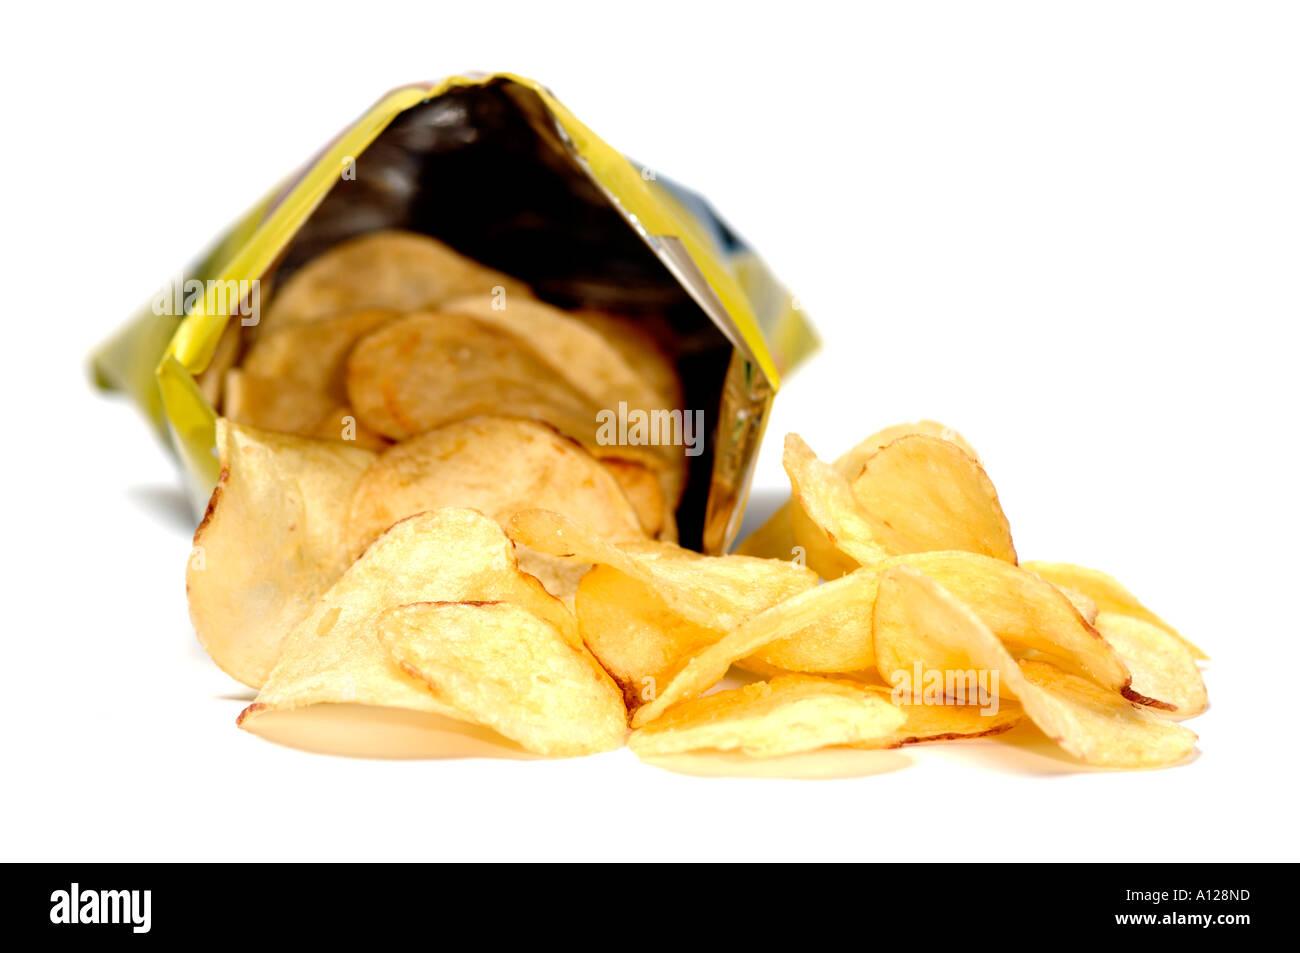 Le sac de chips Photo Stock